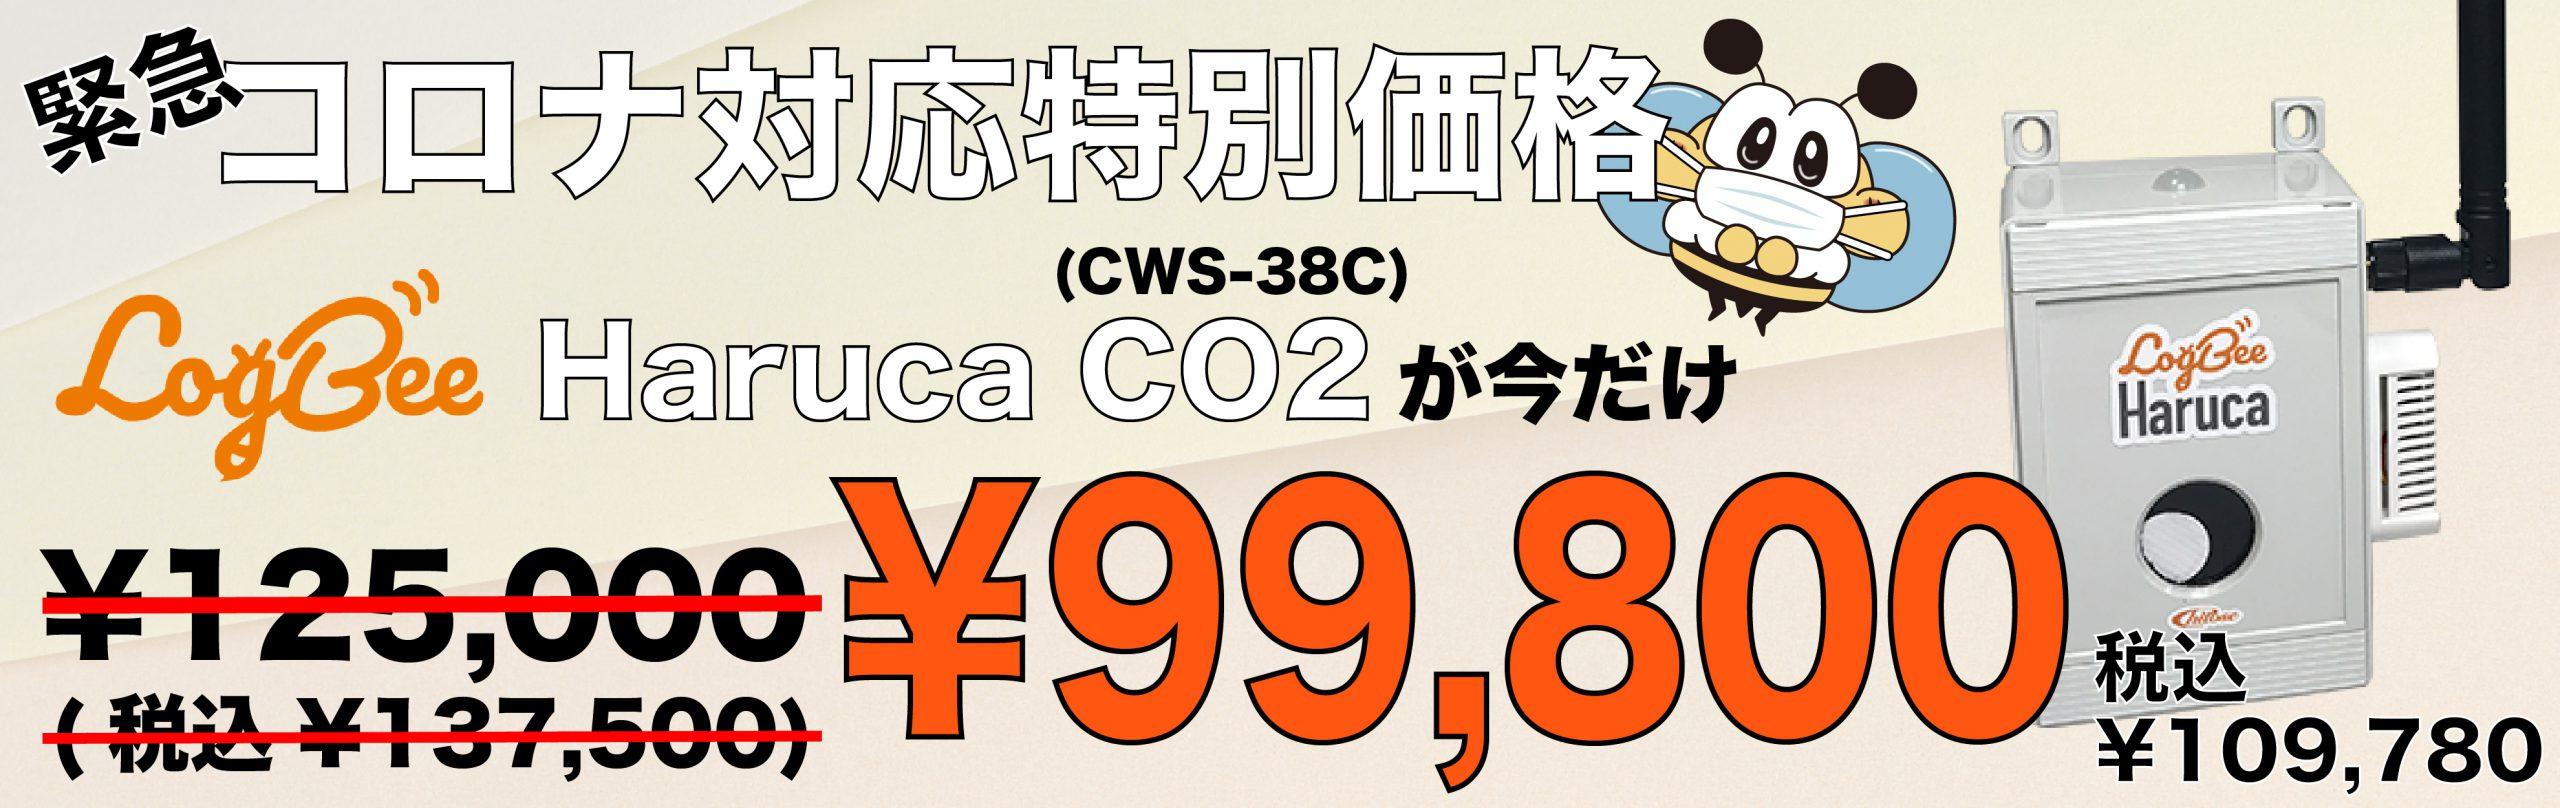 HarucaCO2_コロナ対策価格